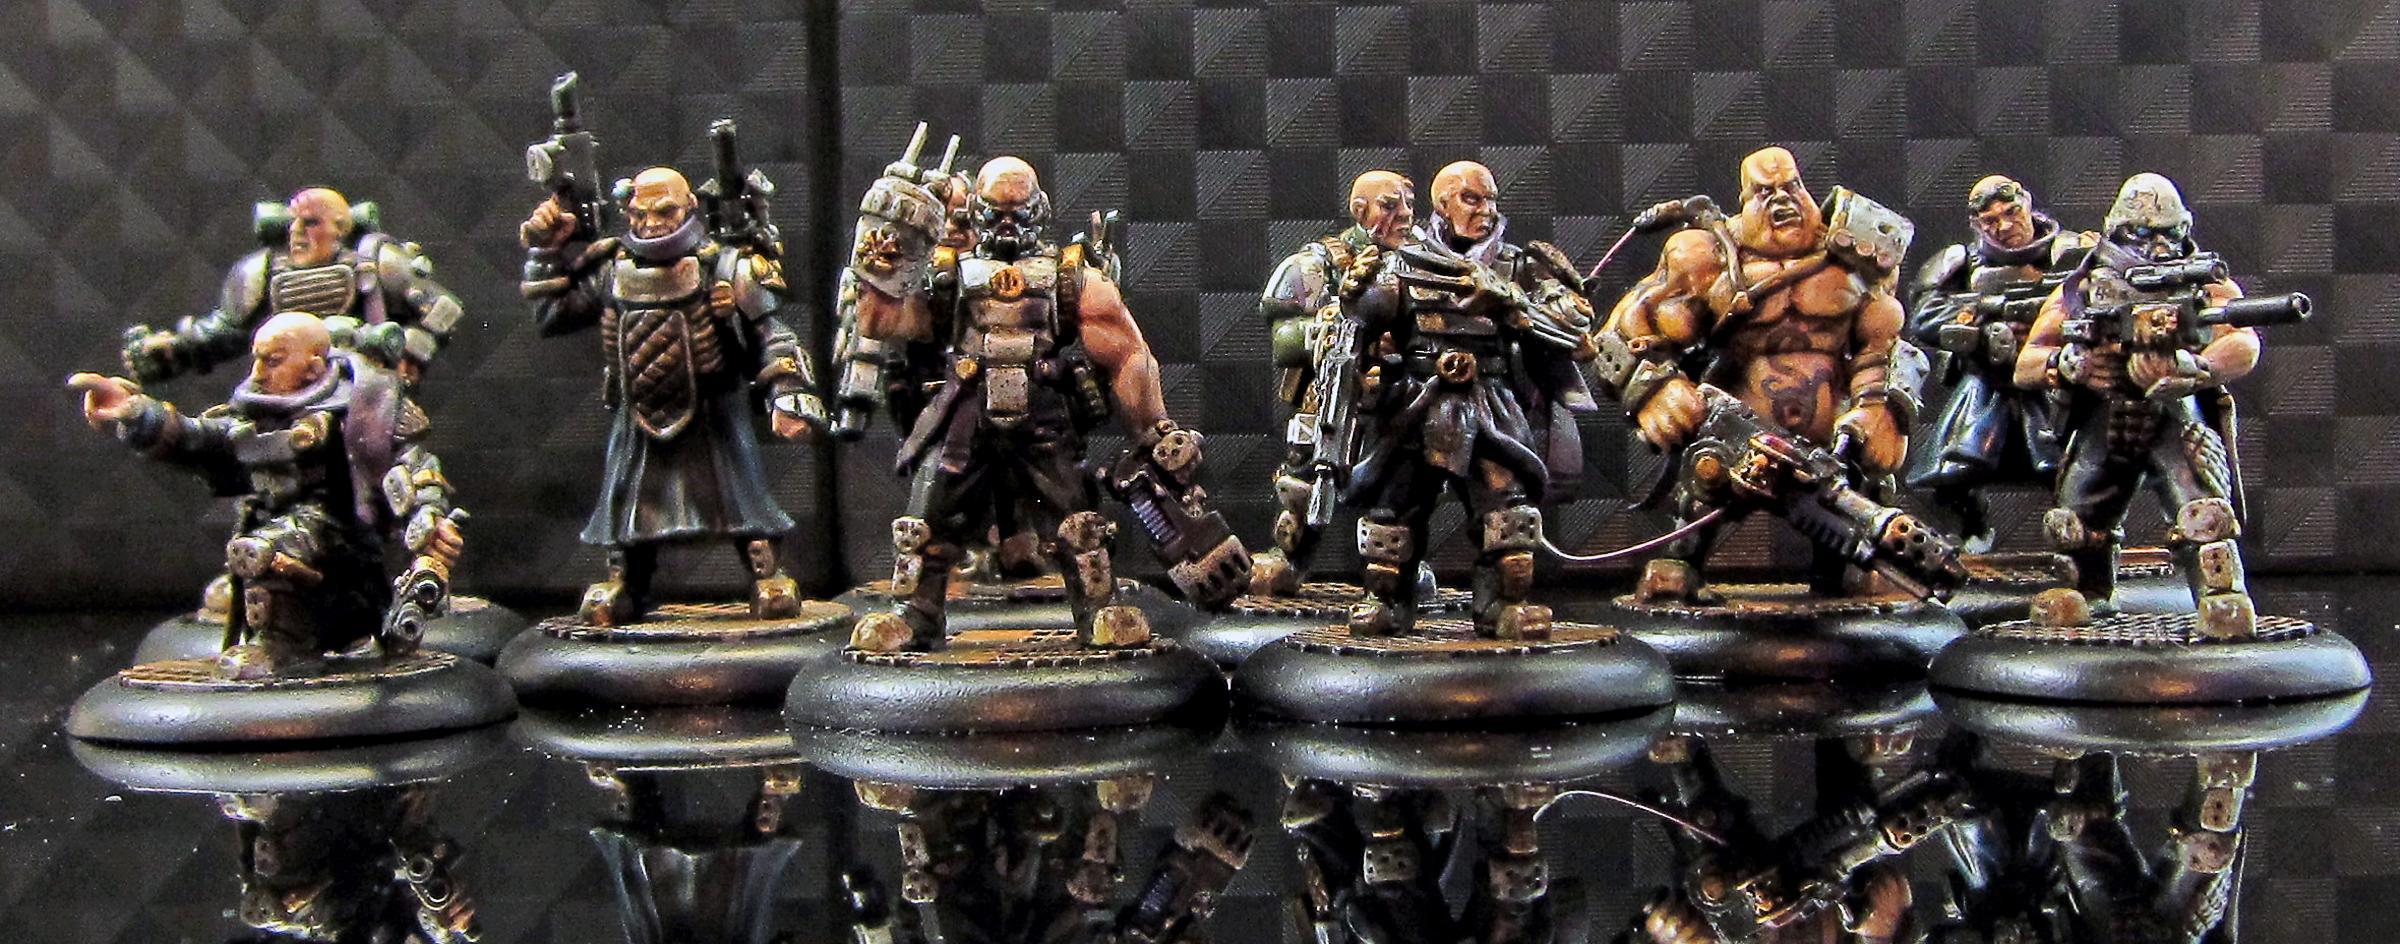 Cult, Genesteaerl, Hybrids